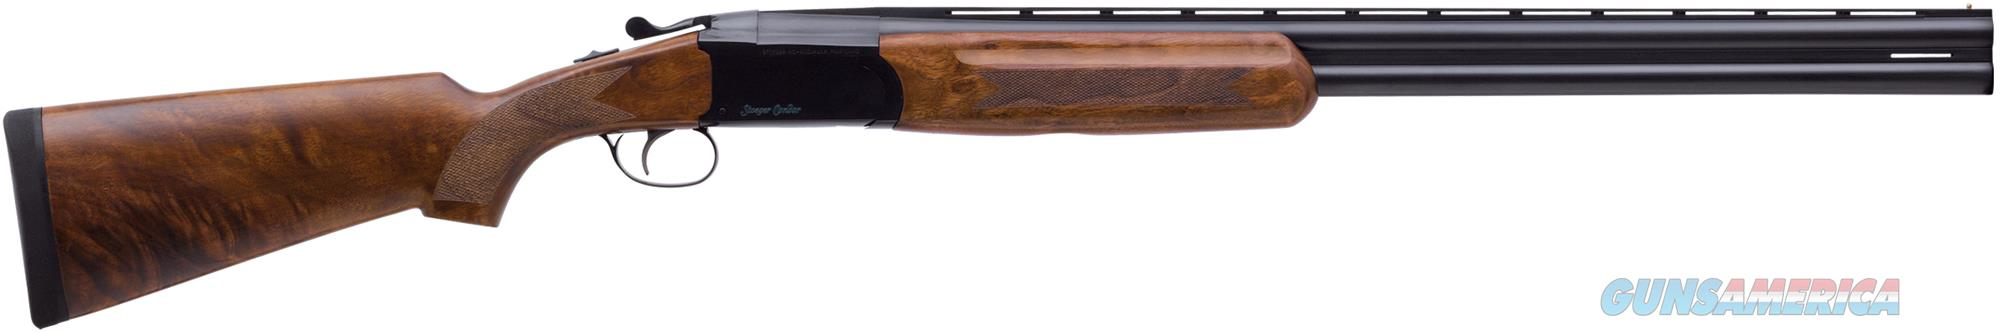 "Stoeger Condor Field 12 GA 28""BBL NIB 31438 O/U  Guns > Shotguns > Stoeger Shotguns"